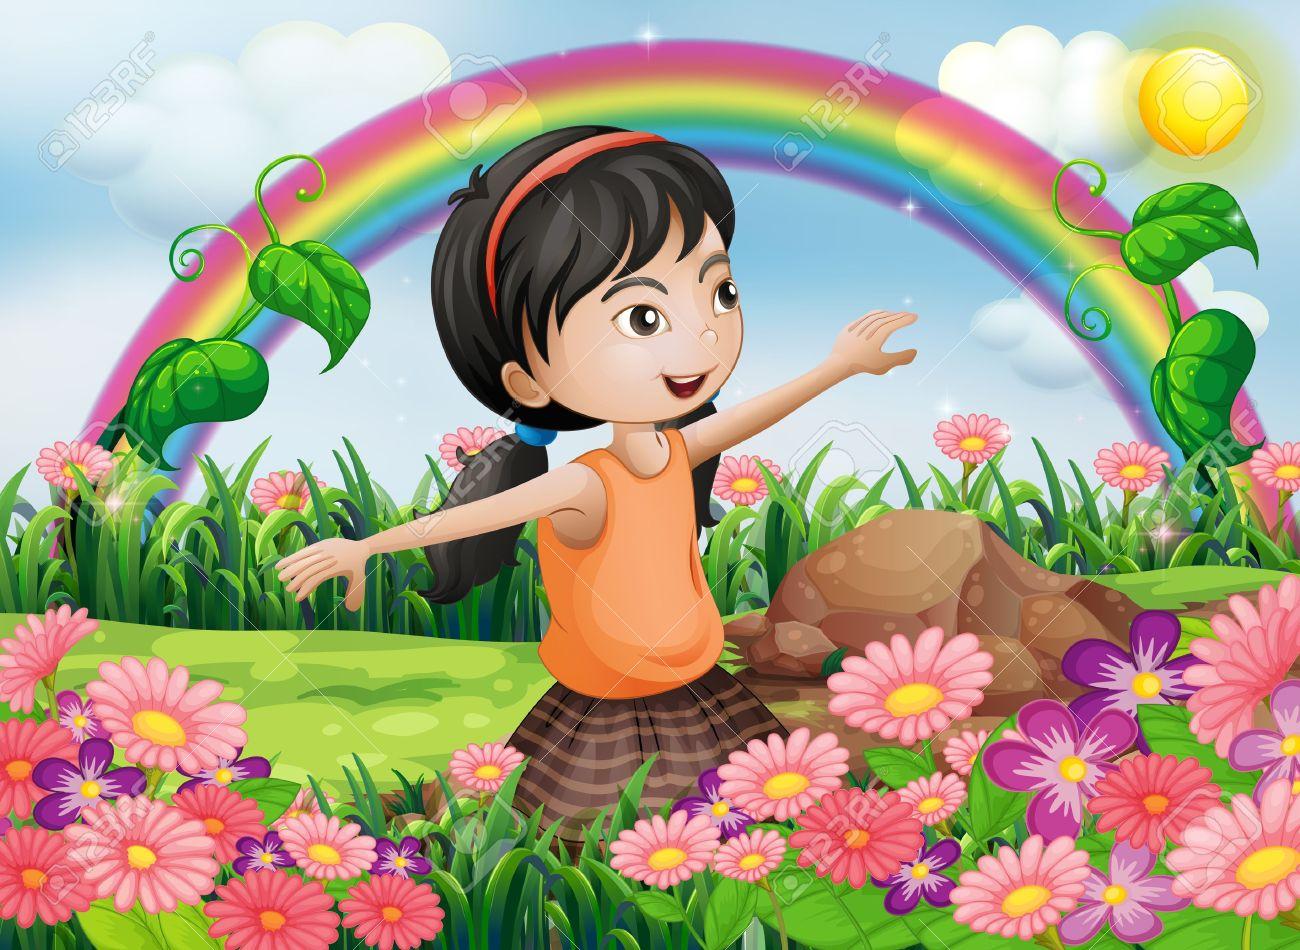 Flower garden cartoon - Garden Cartoon Illustration Of A Happy Girl At The Garden With Fresh Blooming Flowers